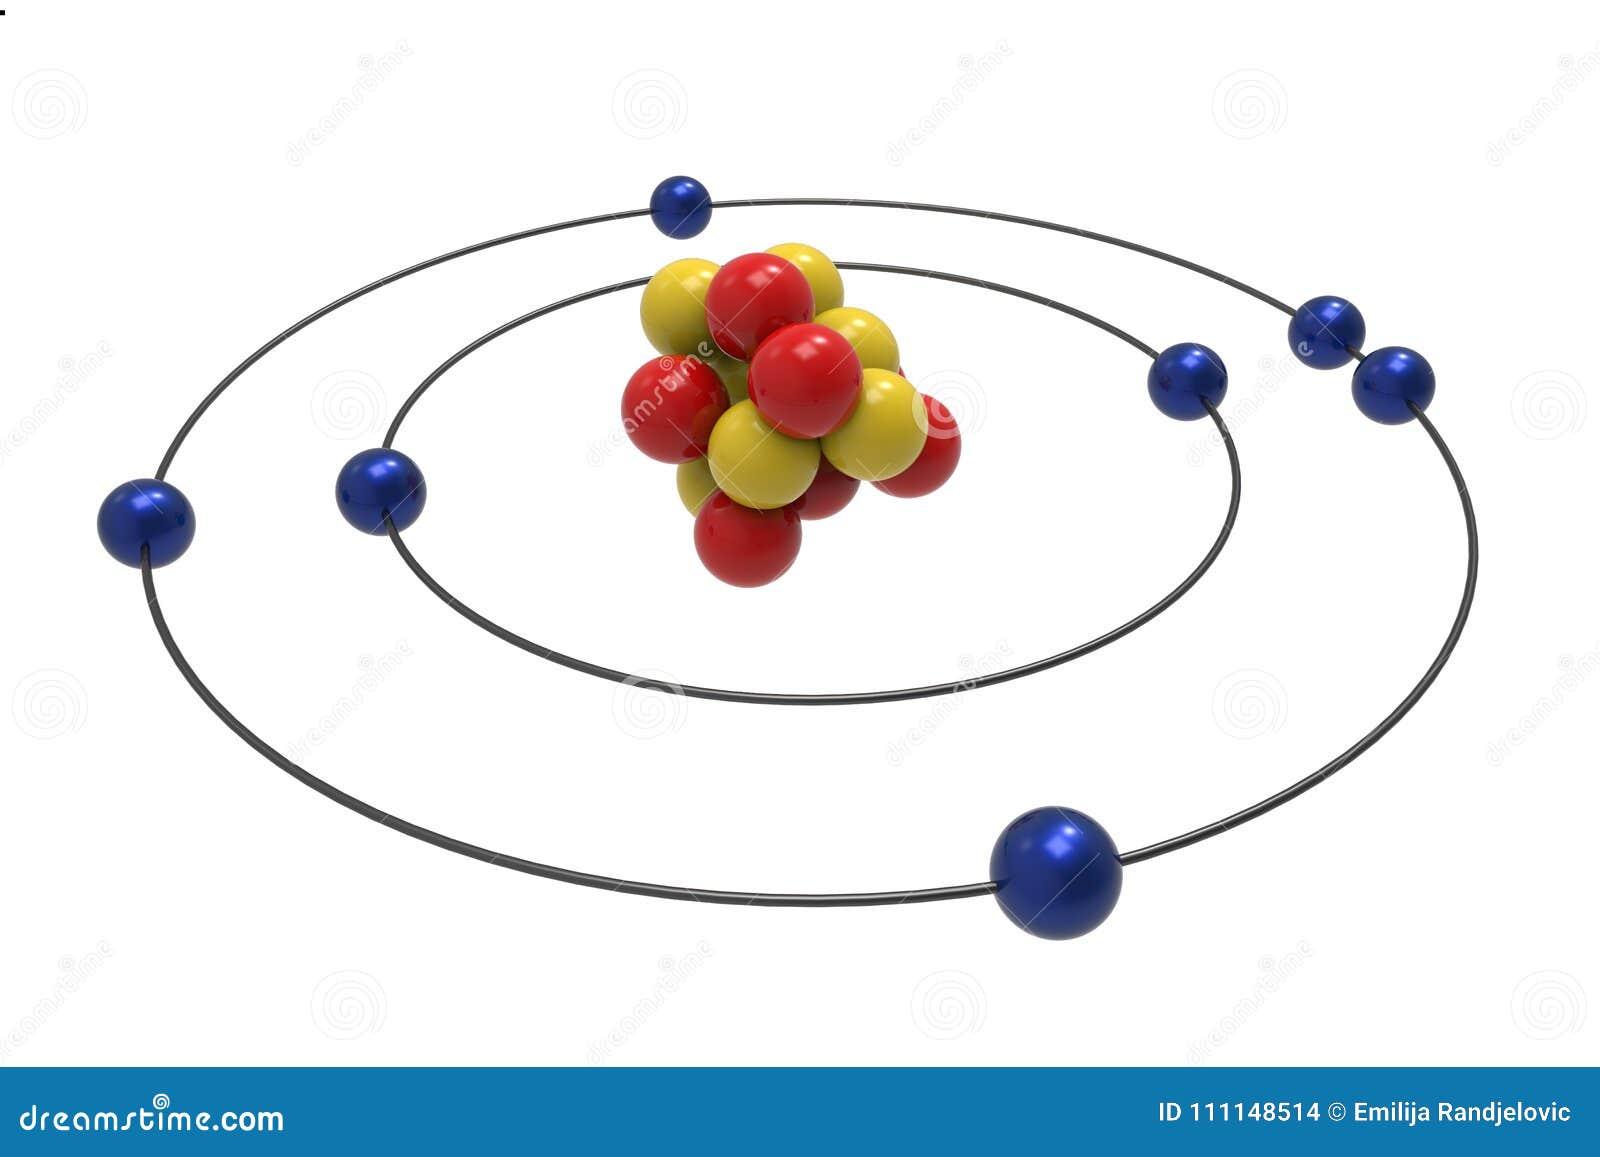 Bohr model of nitrogen atom with proton neutron and electron bohr model of nitrogen atom with proton neutron and electron pooptronica Gallery